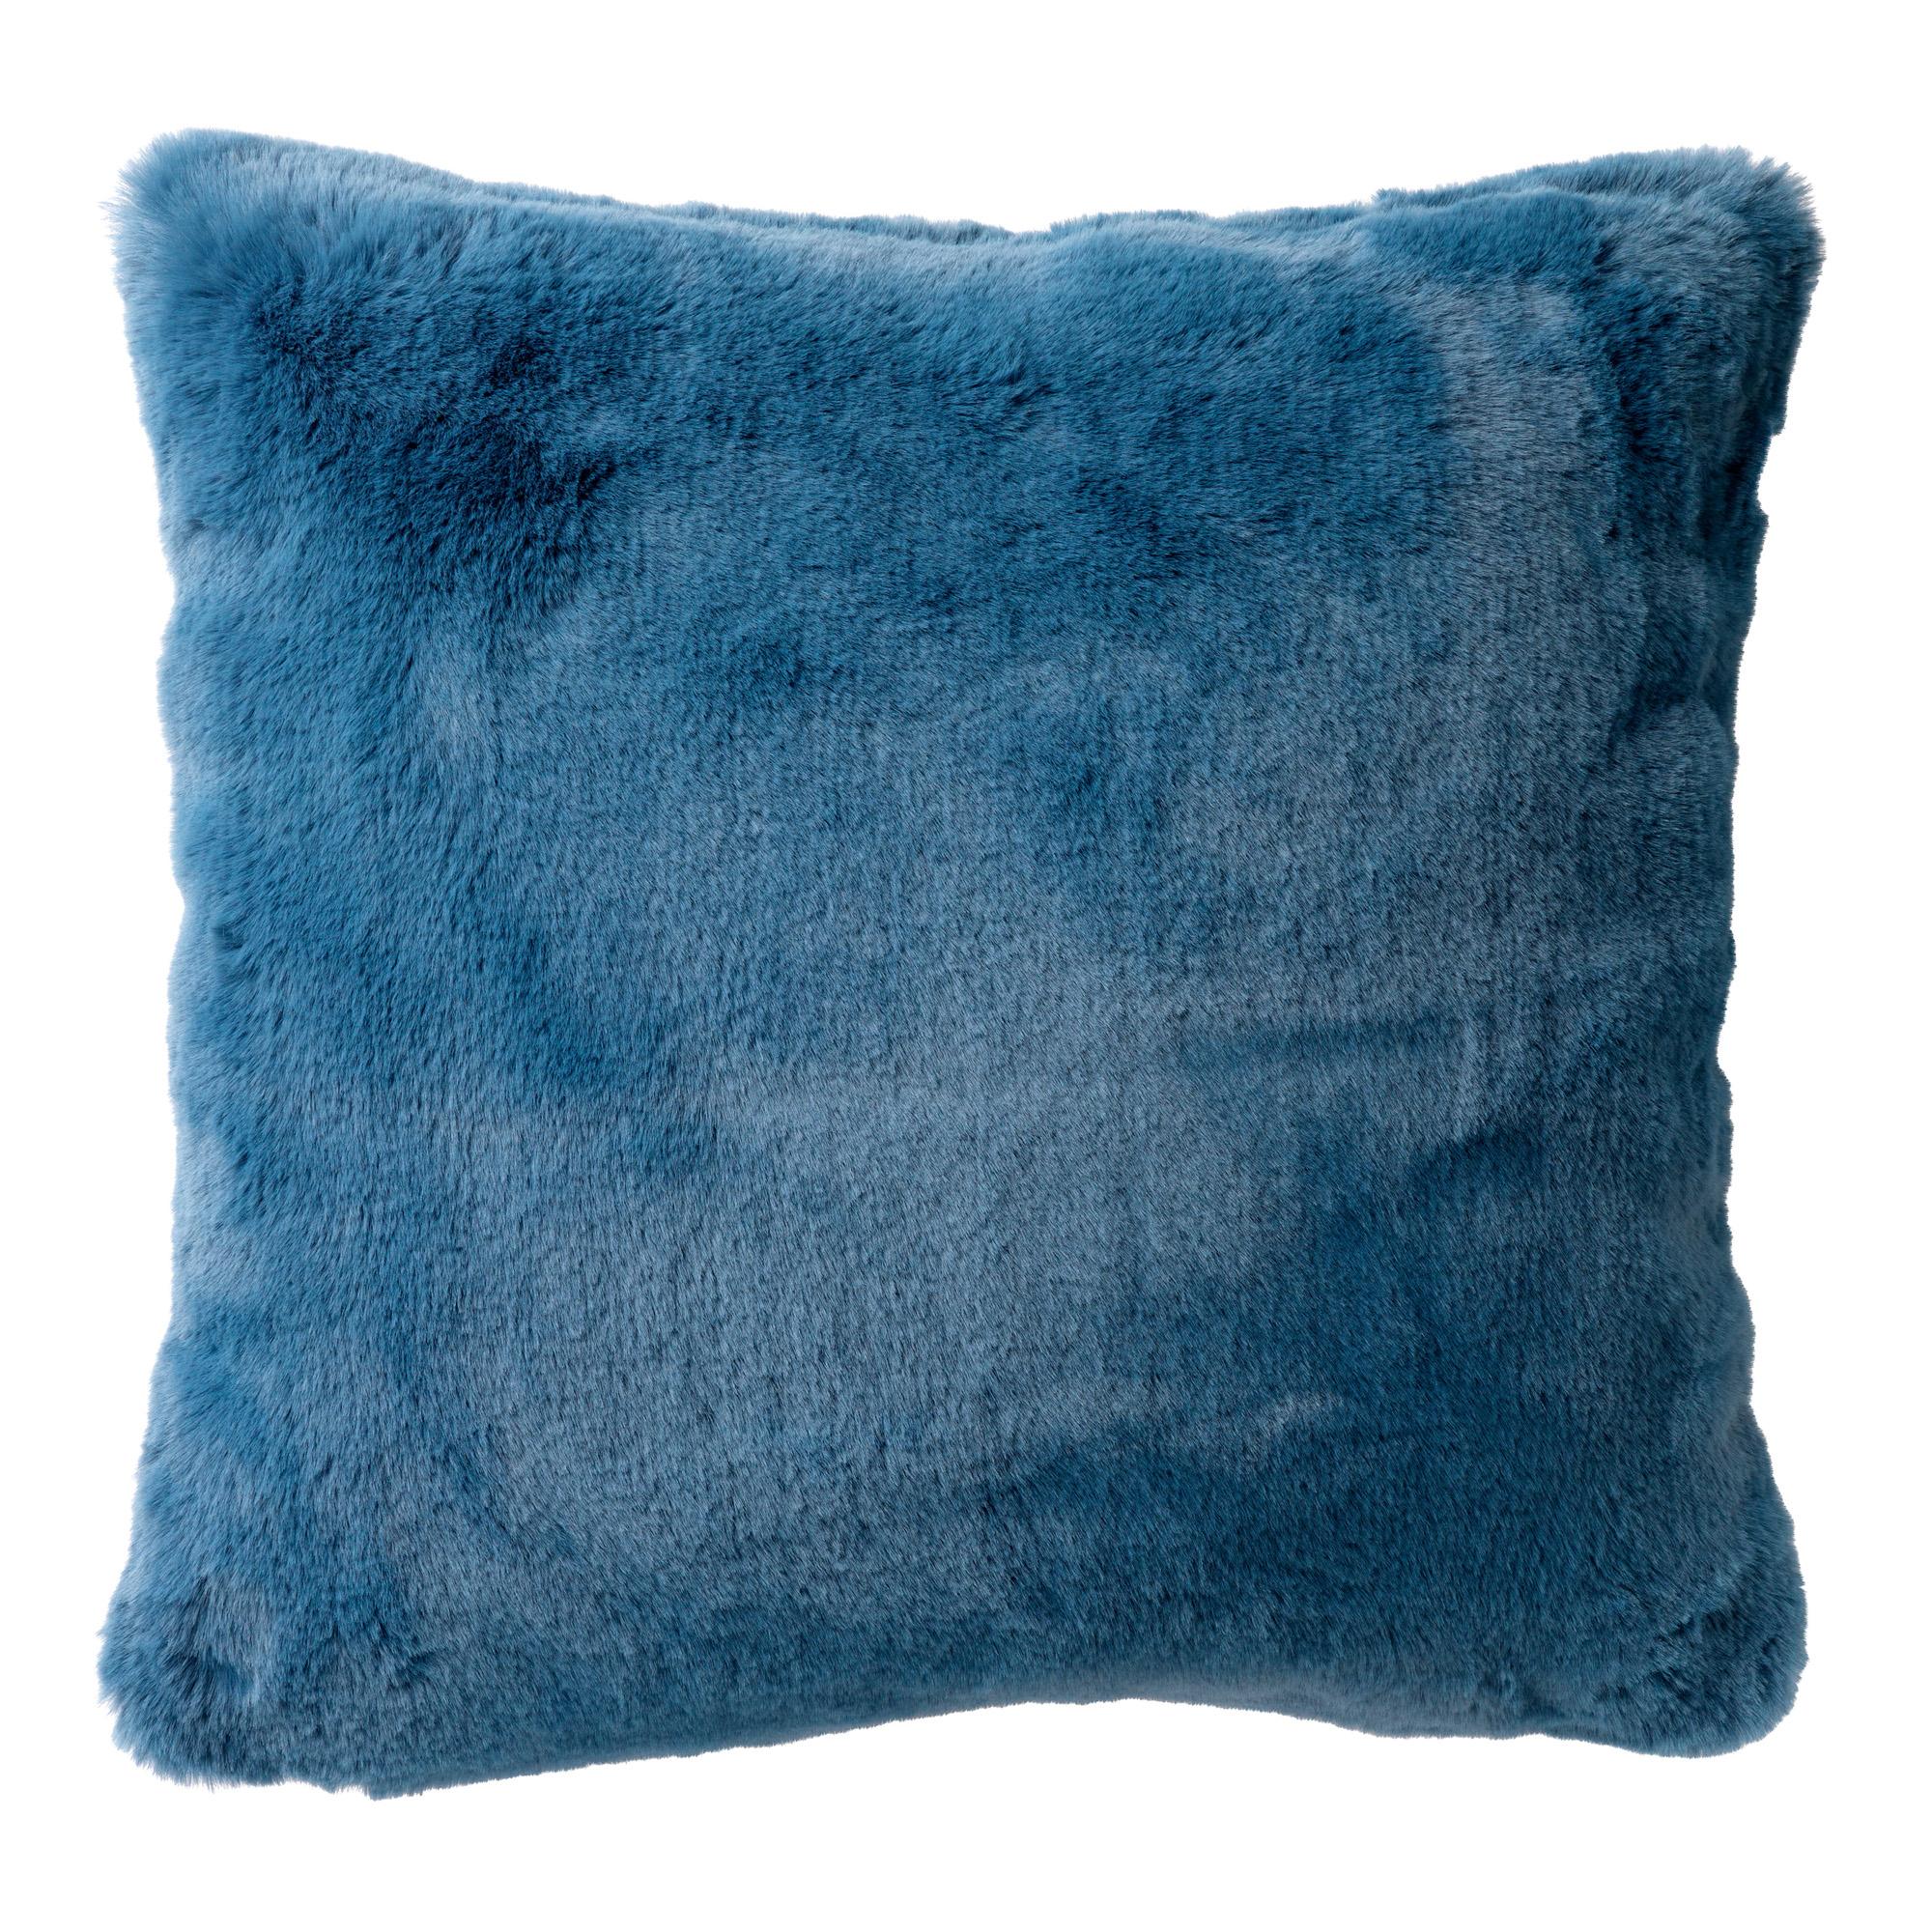 Sierkussen Zaya 45x45 cm Provincial Blue